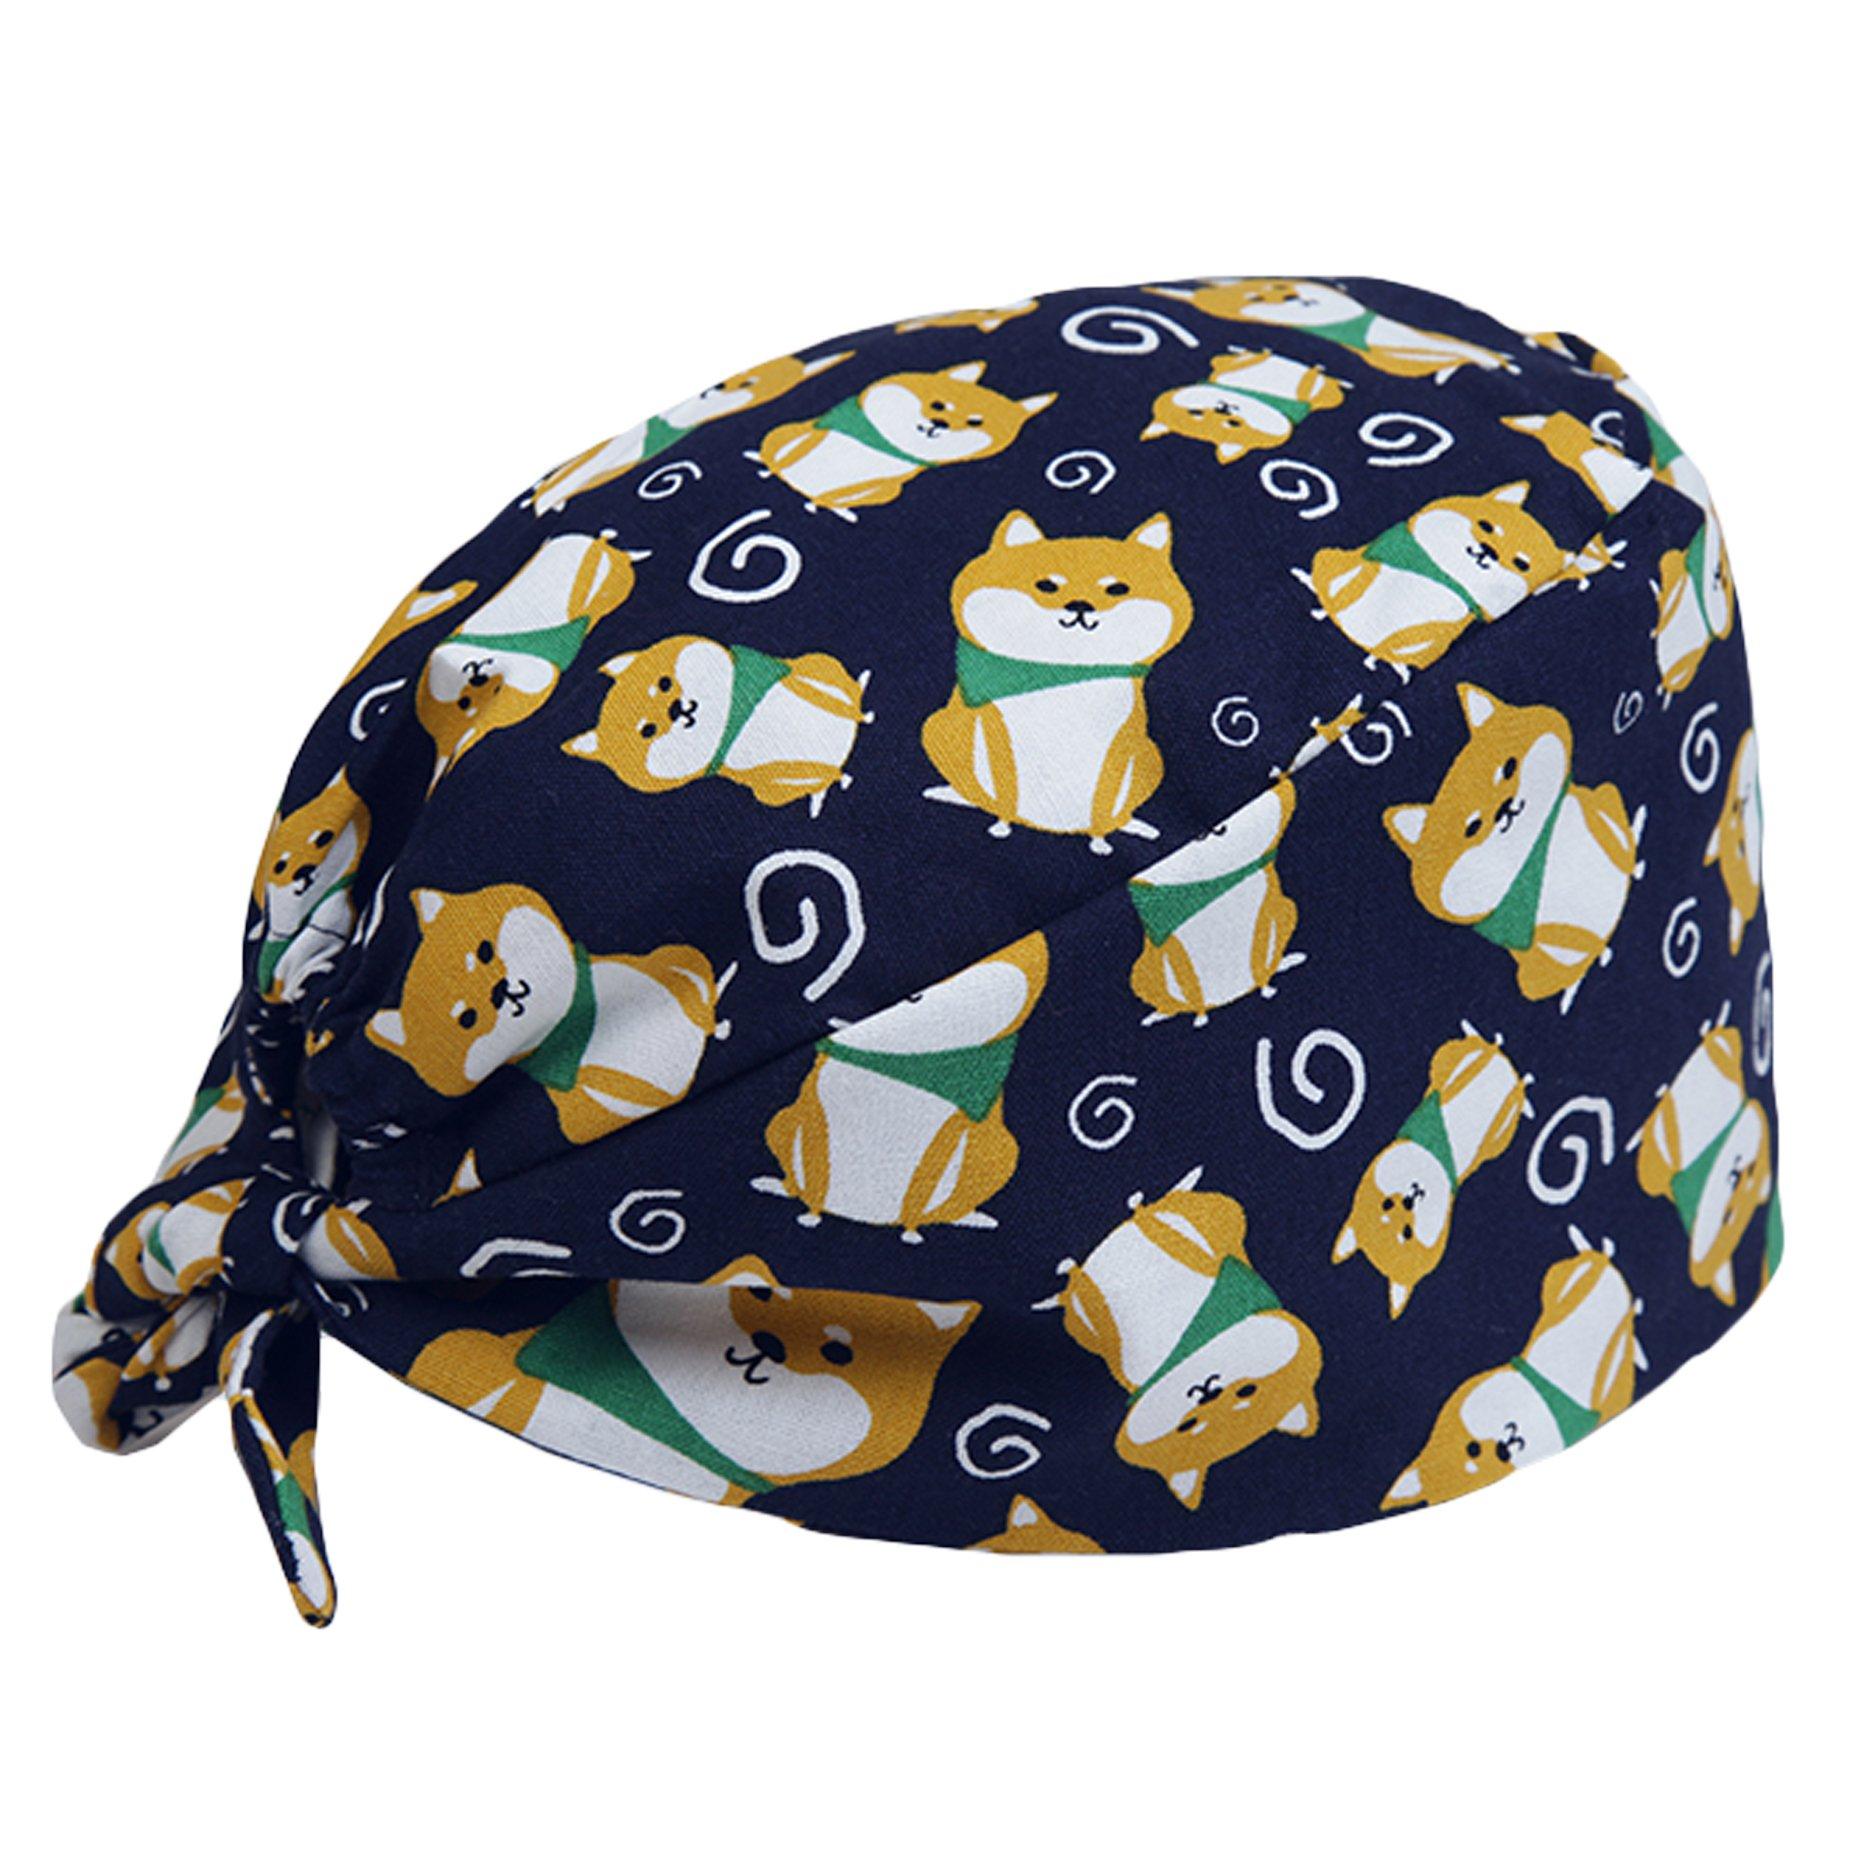 Scrub Cap Surgical Scrub Cap Medical Doctor Bouffant Turban Cap with Sweatband Scrub Hat for Women/Men by Funcl